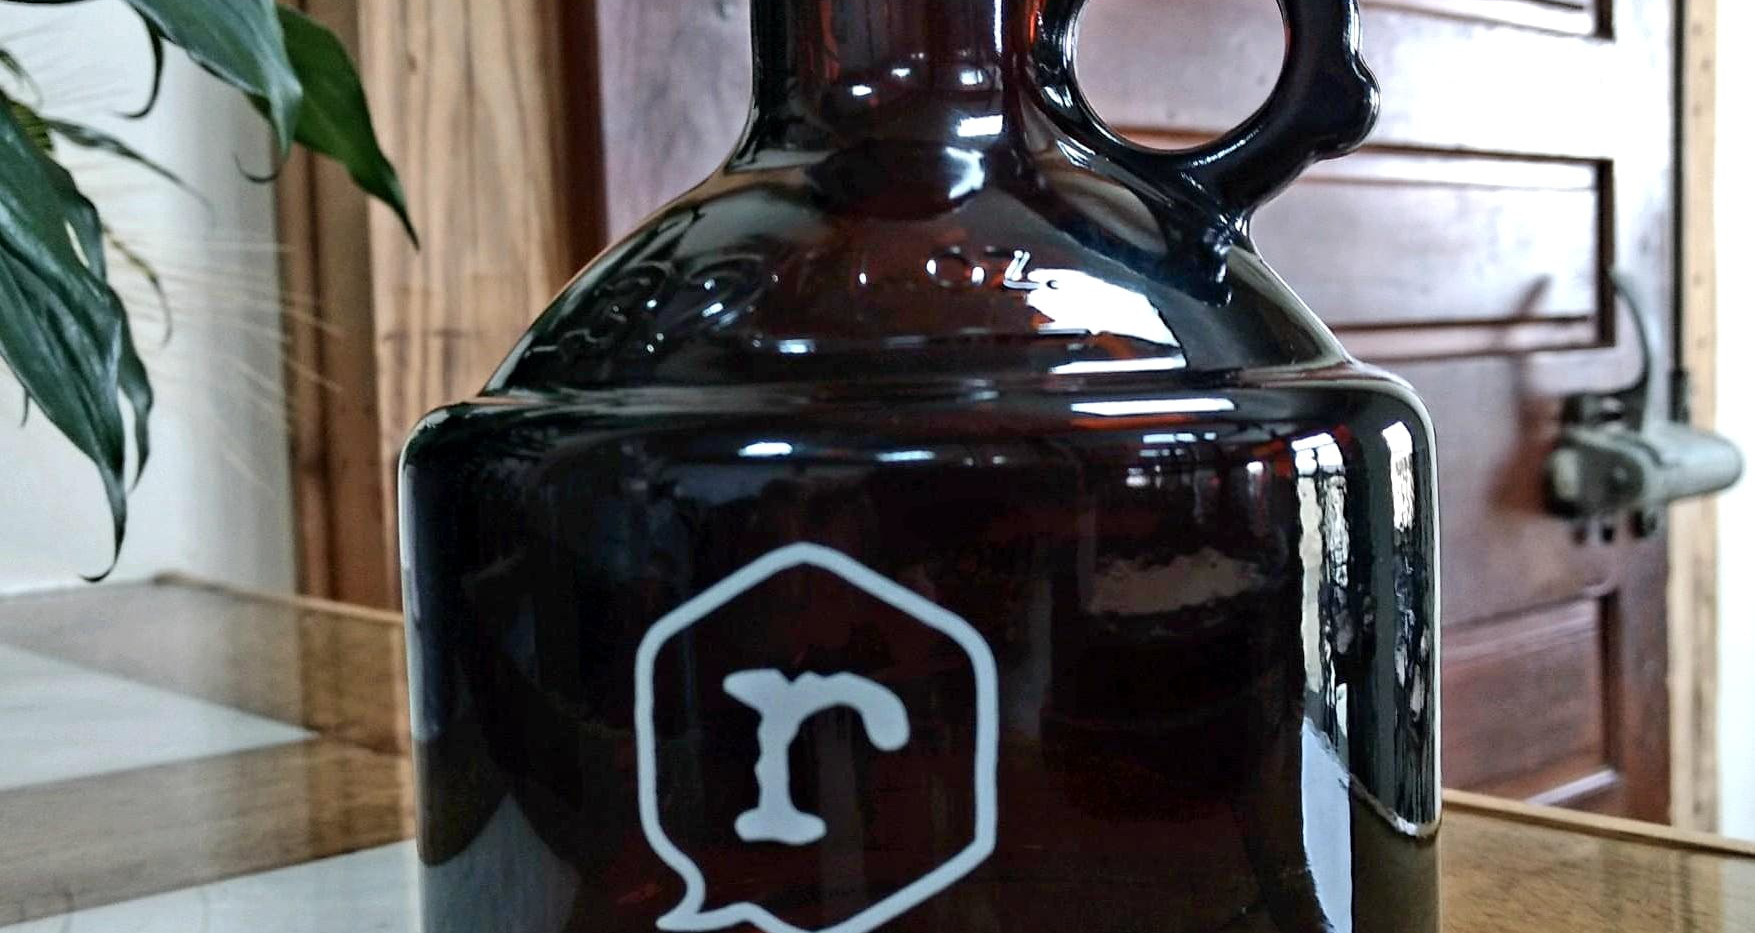 Rhetoric Winery and Brewery